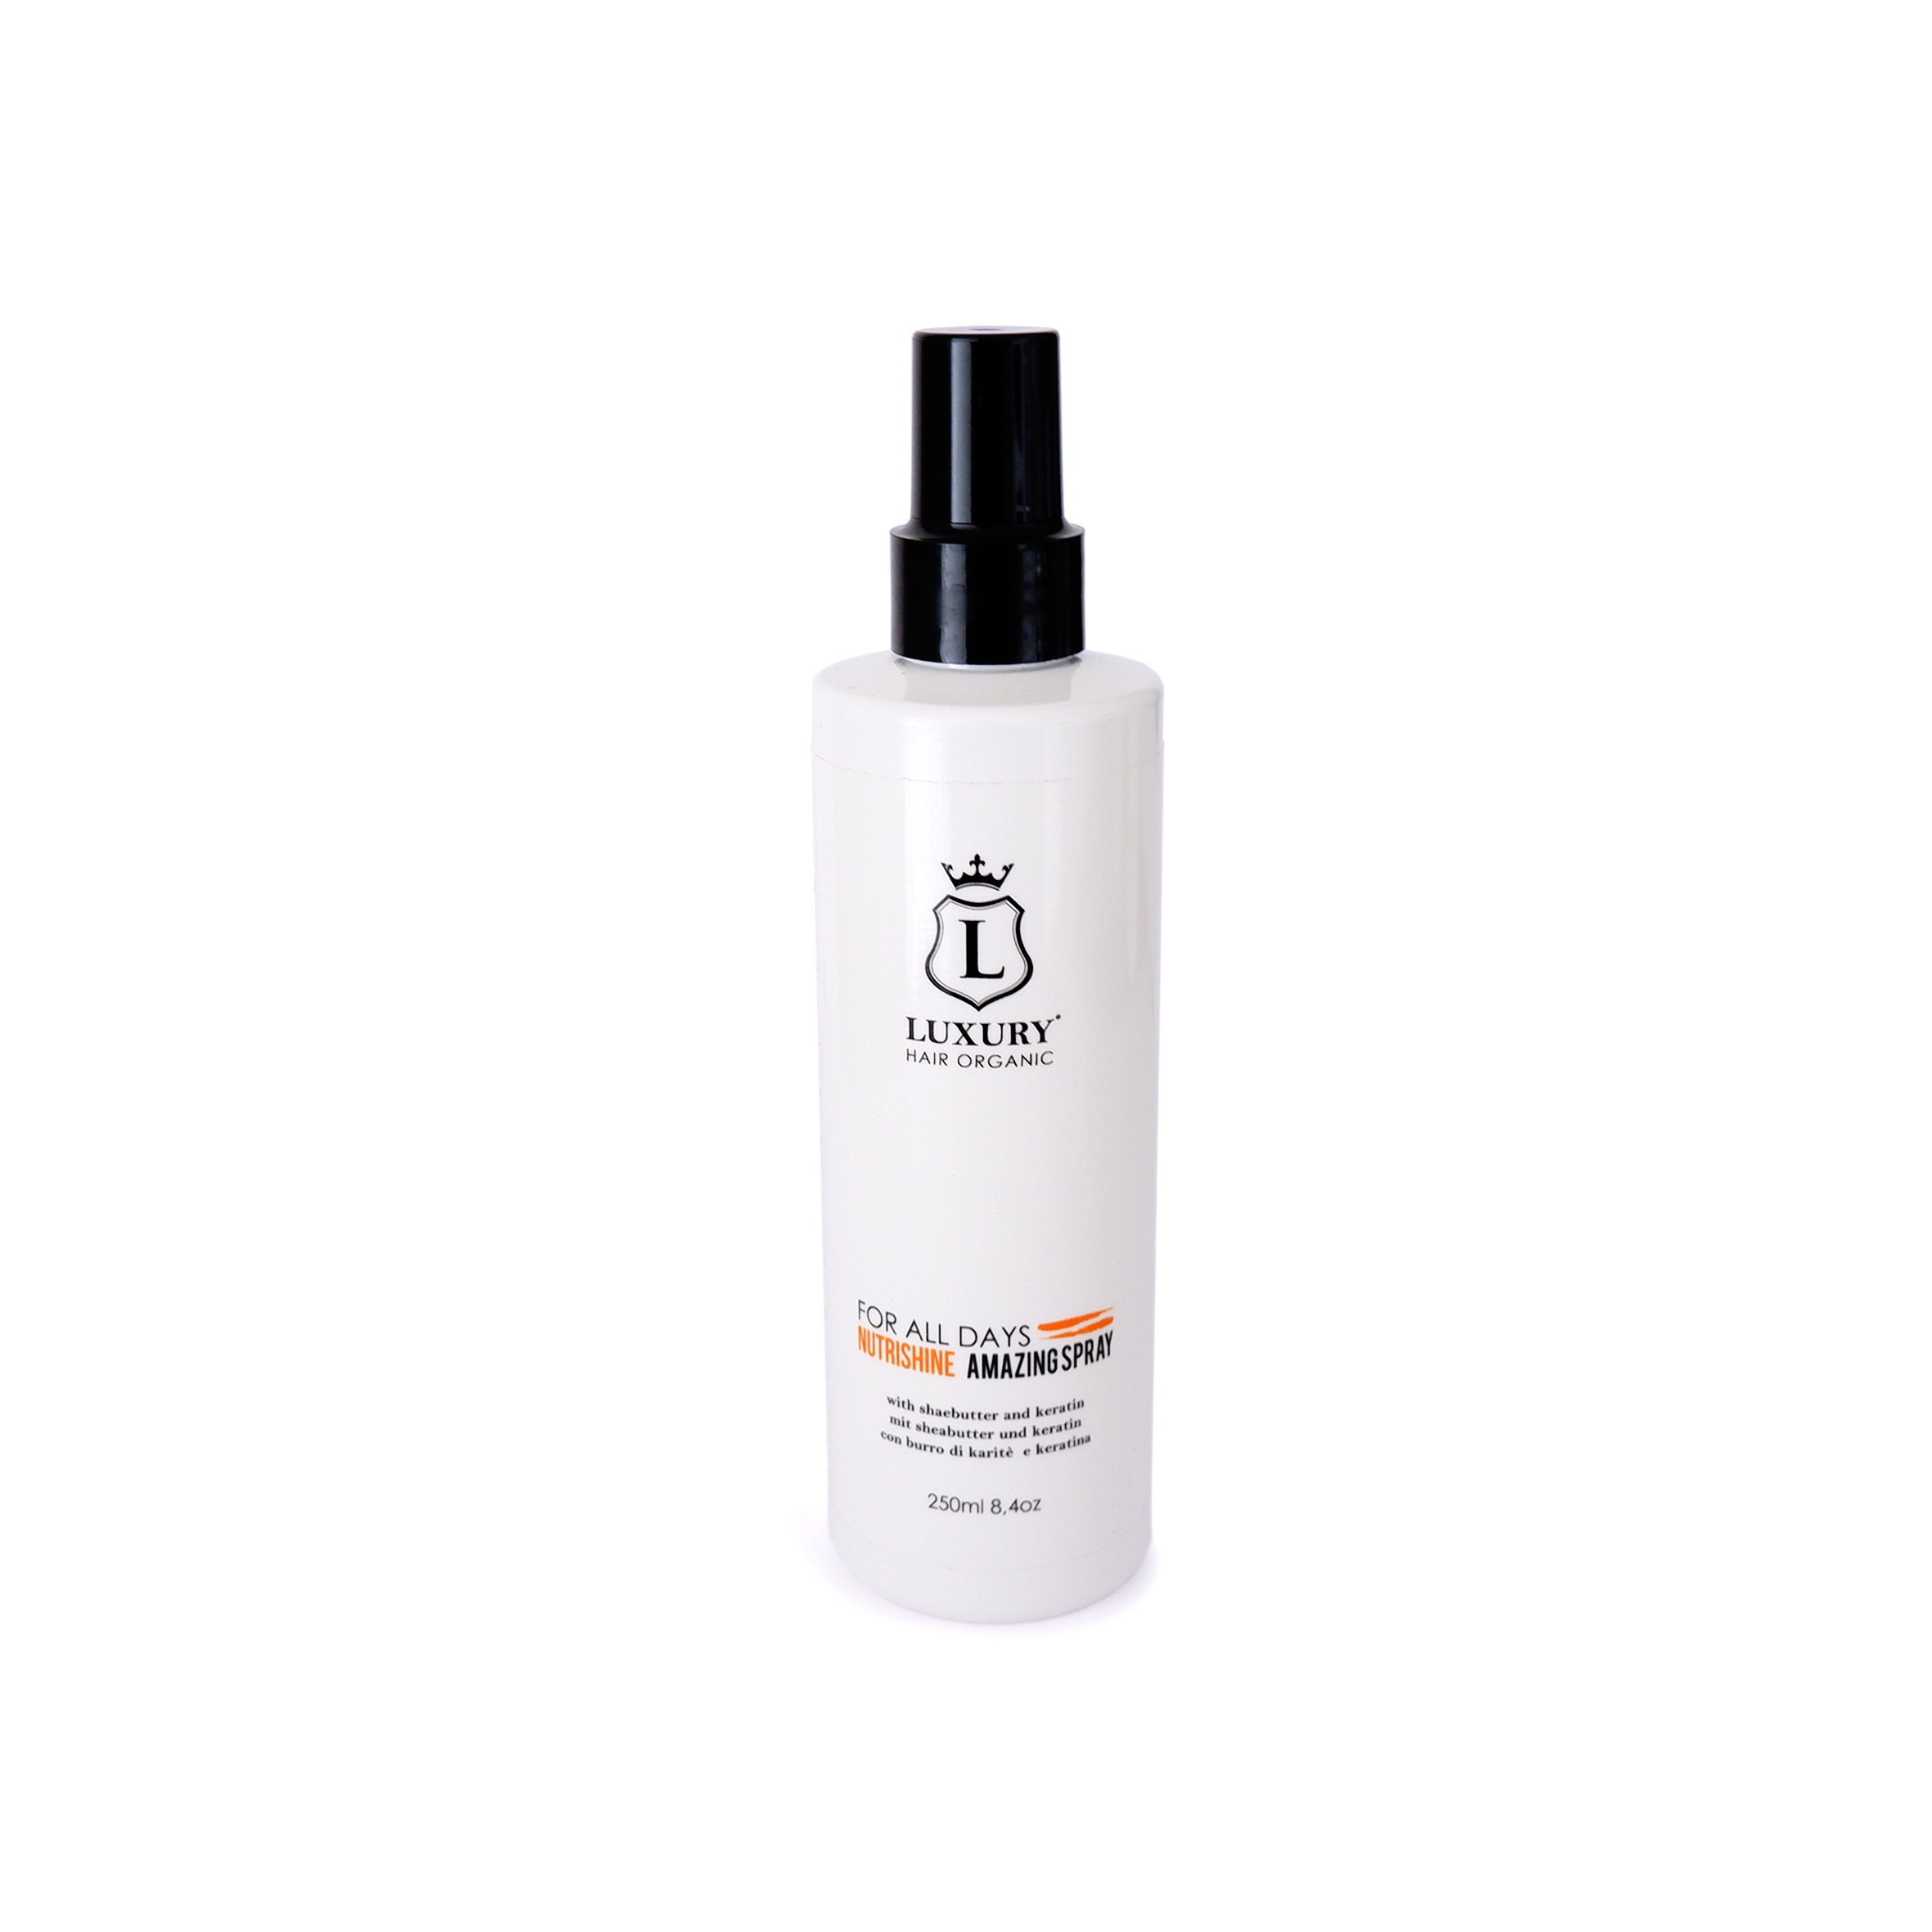 luxury-hair-organic-nutrishine-amazing-keratin-spray-no-rinse-lho0003